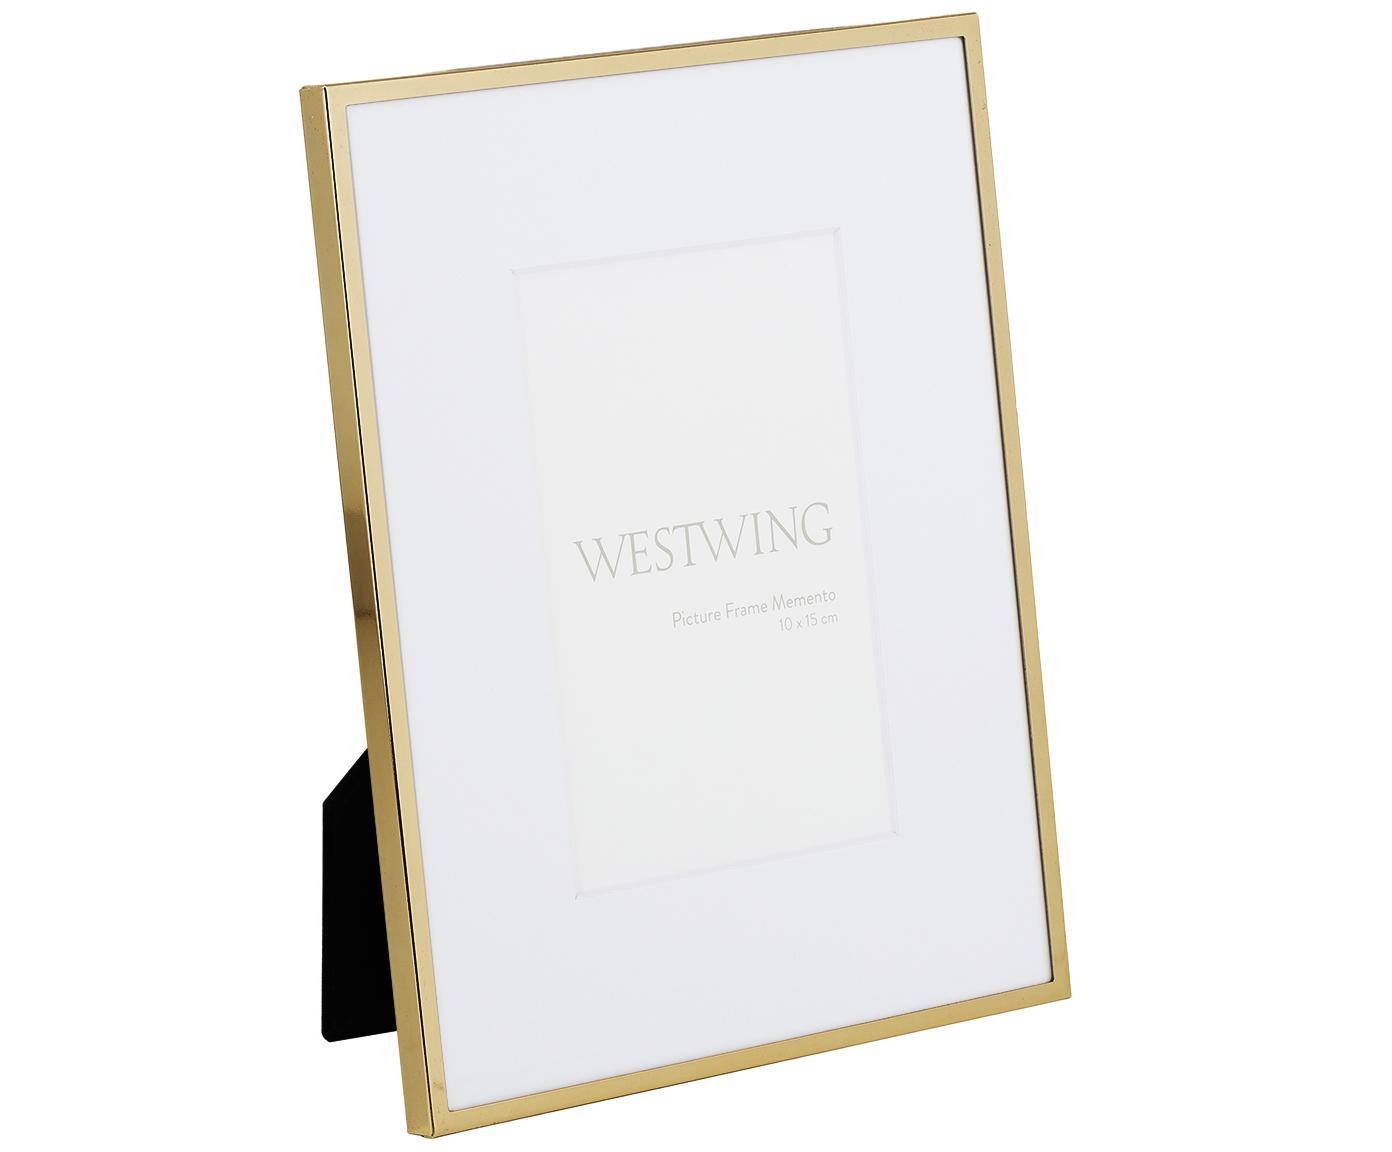 Marco Memento, Parte trasera: tablero de fibras de dens, Dorado, 10 x 15 cm